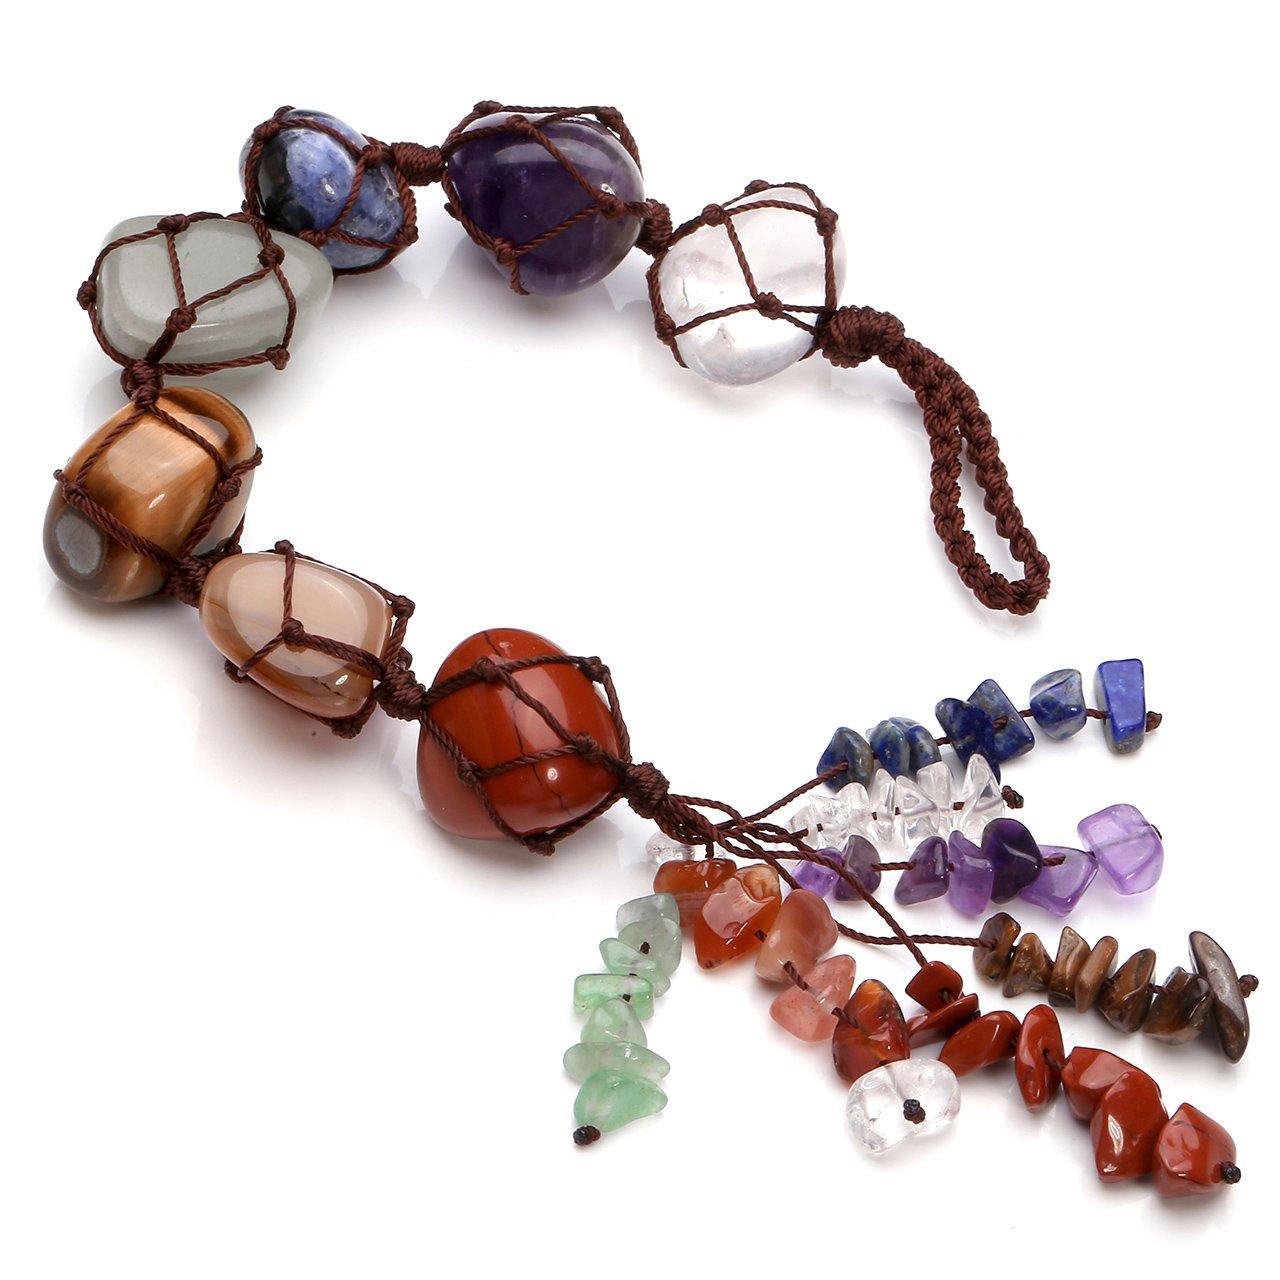 Jovivi Chakra Stones Set, 7 Chakras Healing Crystals Wall Hanger Tumbled Gemstones Tassel Spiritual Meditation Hanging Ornament/Window Ornament/Feng Shui